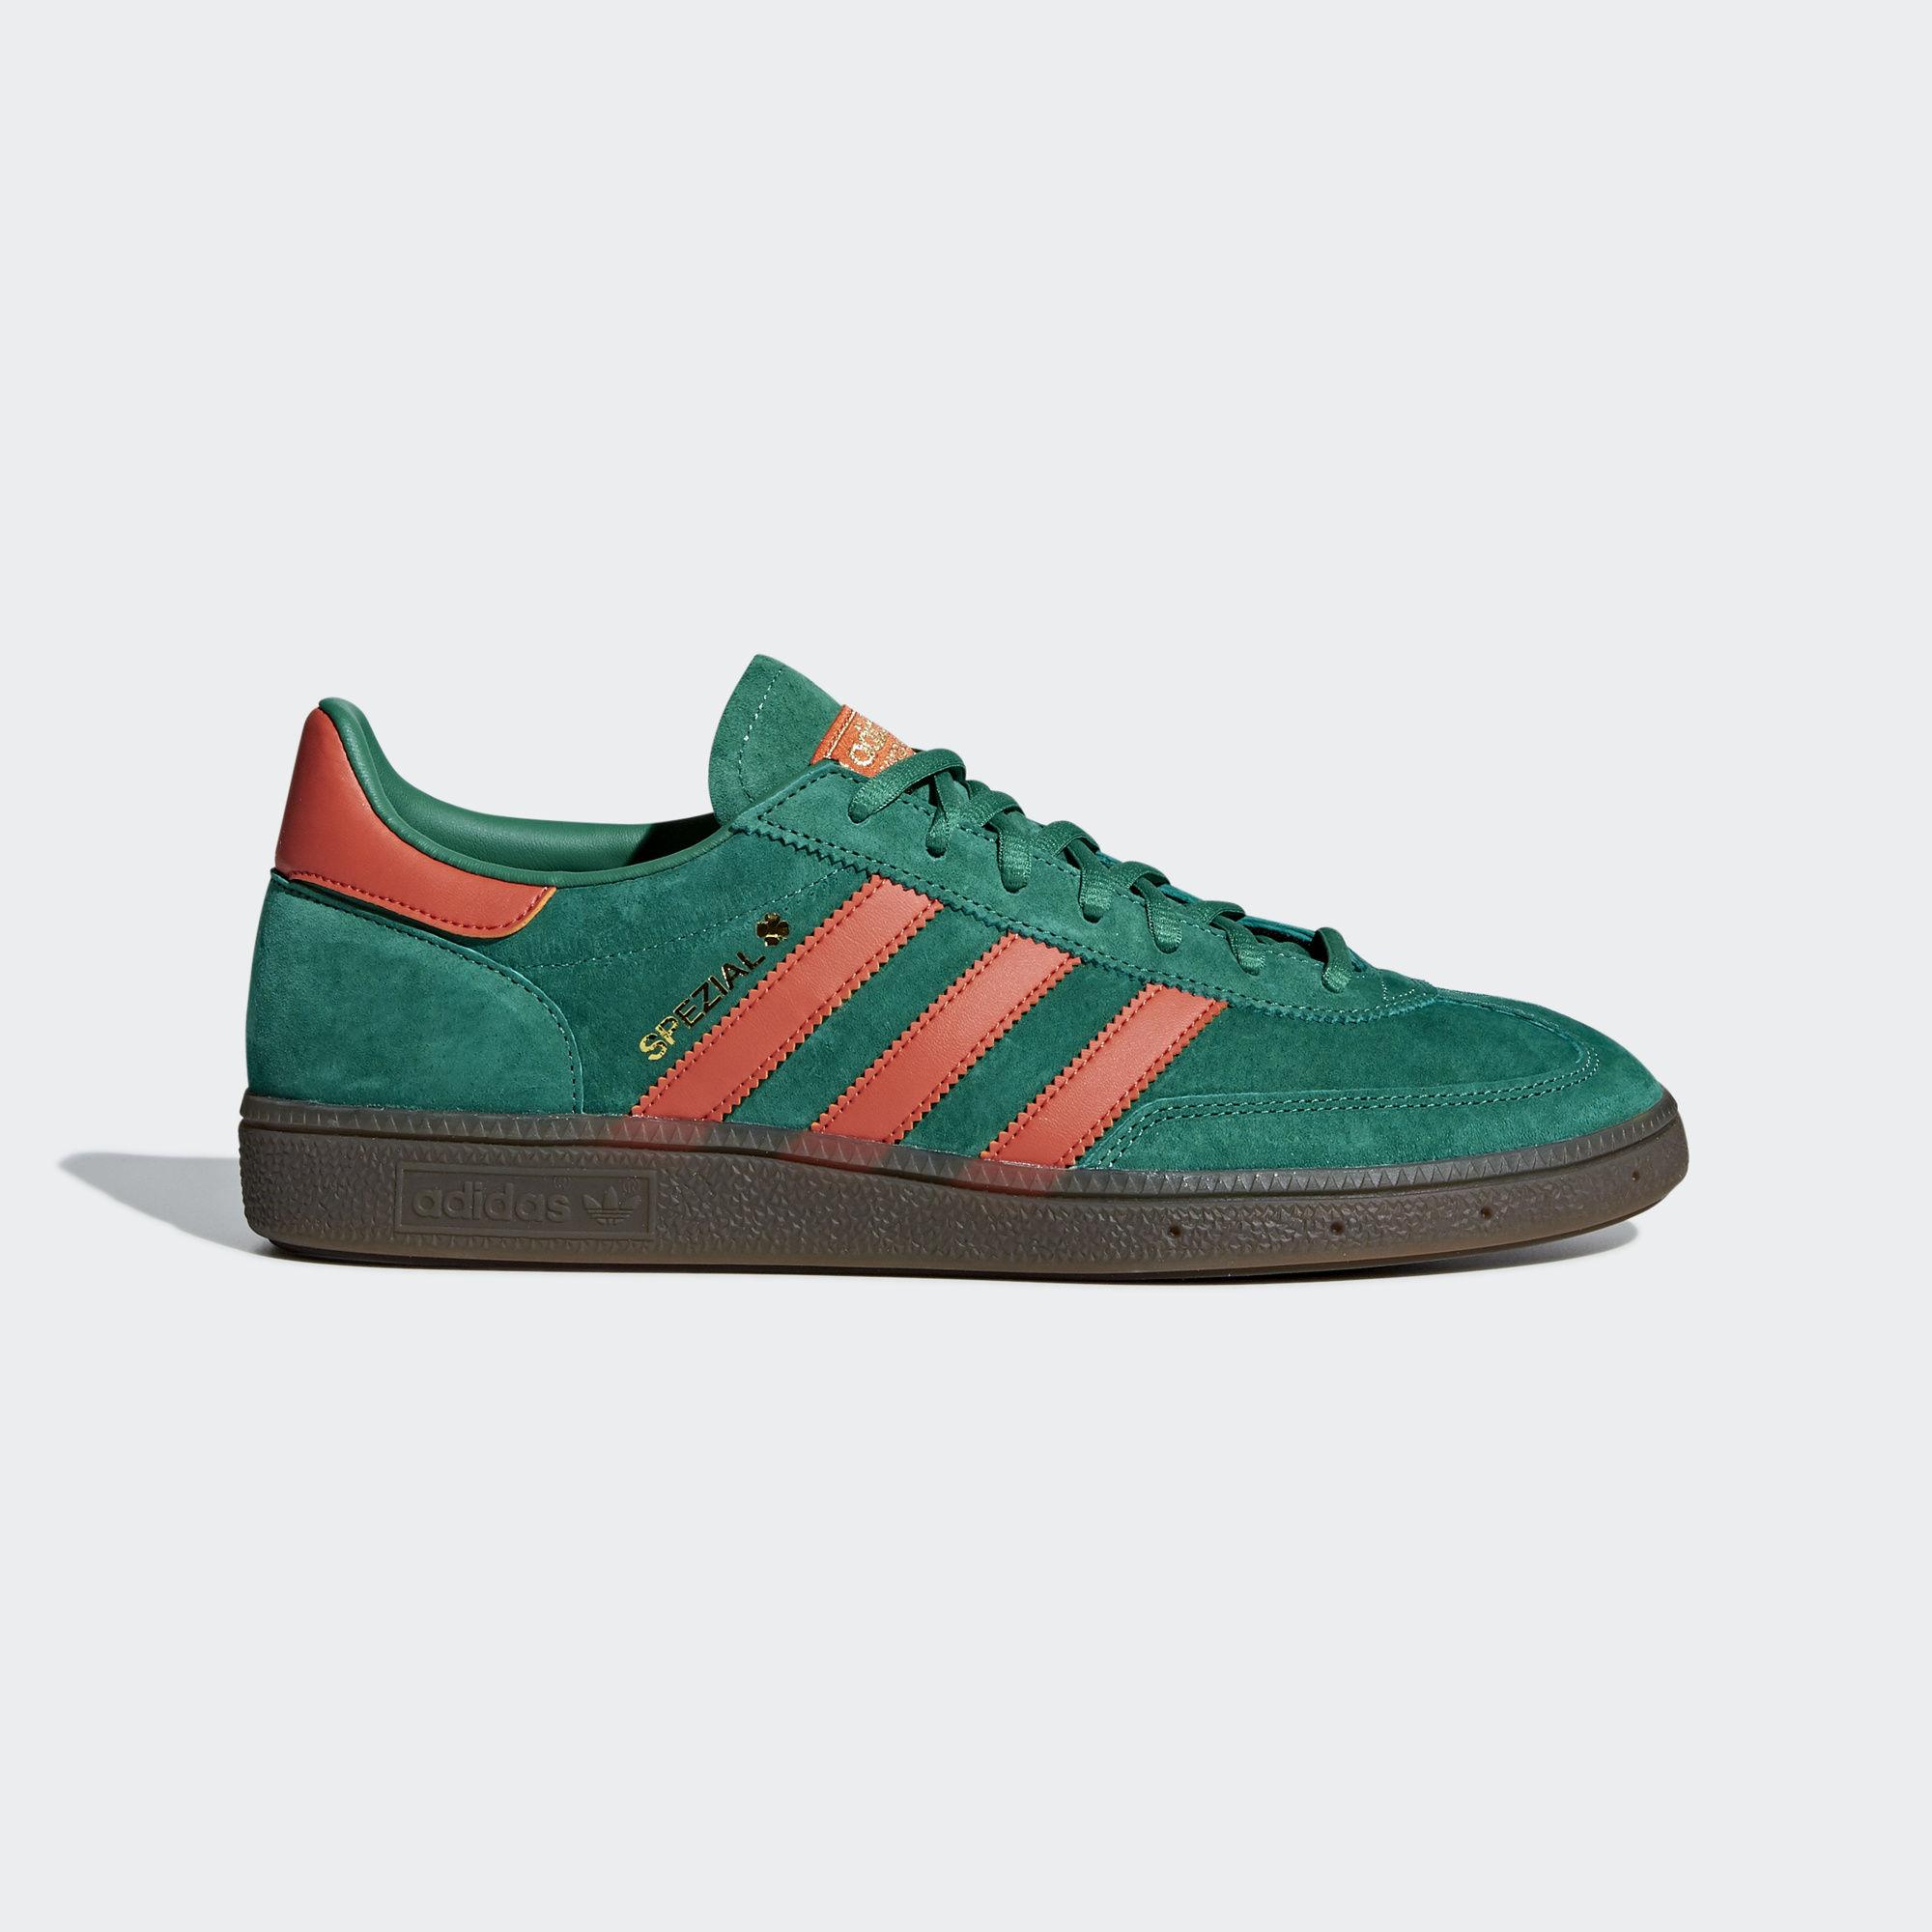 Handball Spezial Shoes shop 25 70% | Gratis verzending | Afound